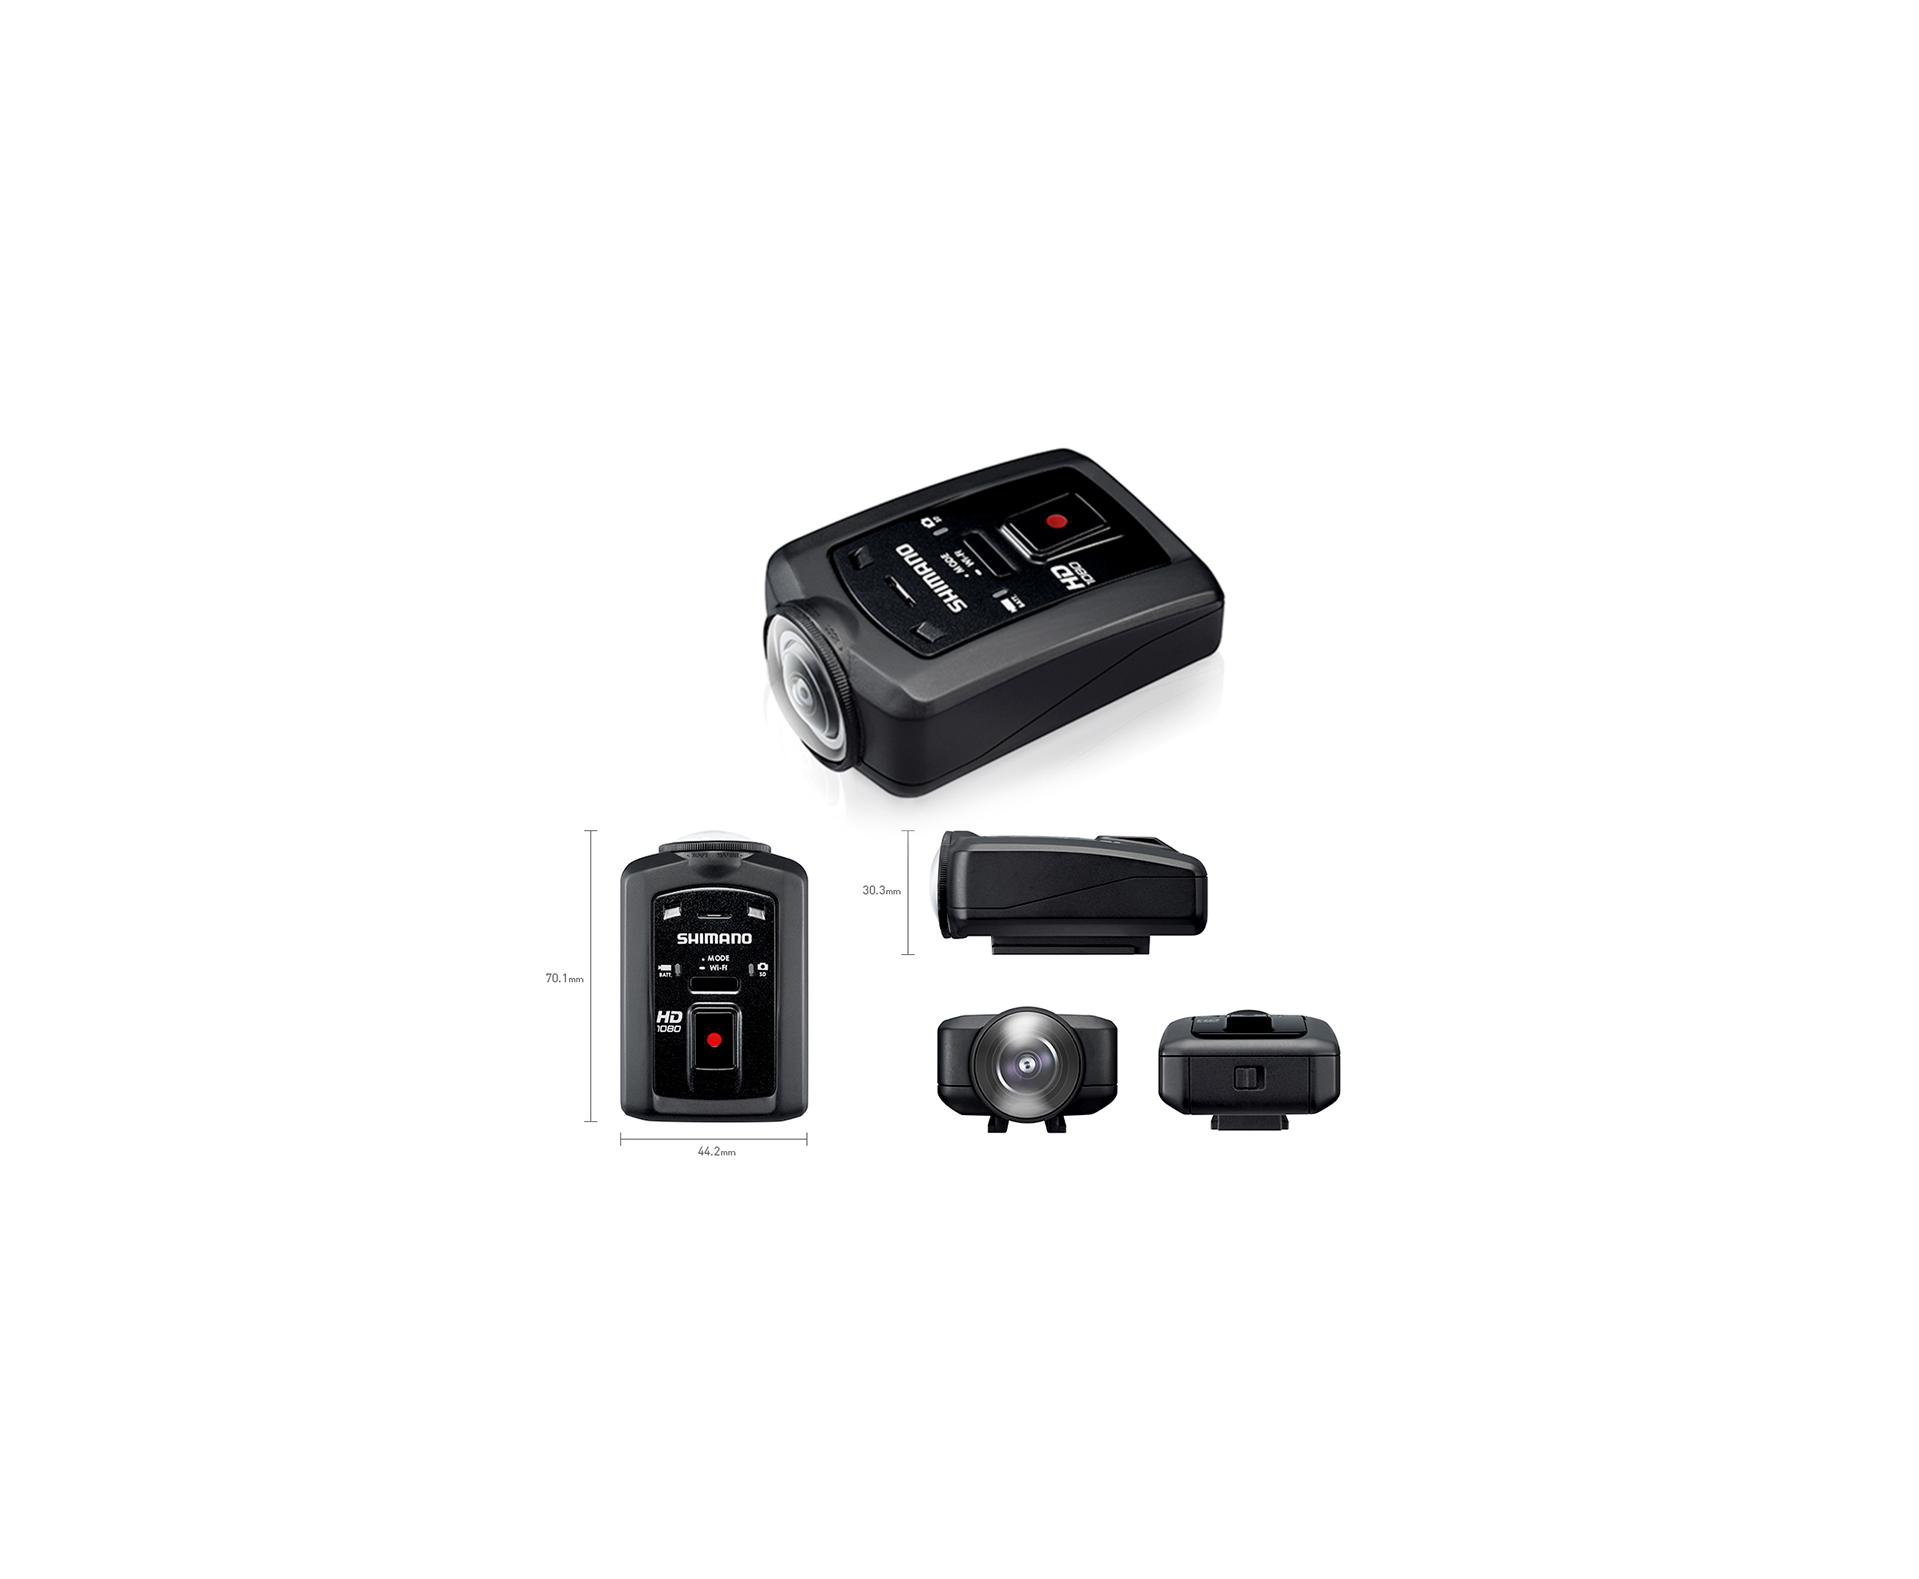 Camera Hd Digital à Prova D´água - Sport Camera Cm-1000 - Shimano